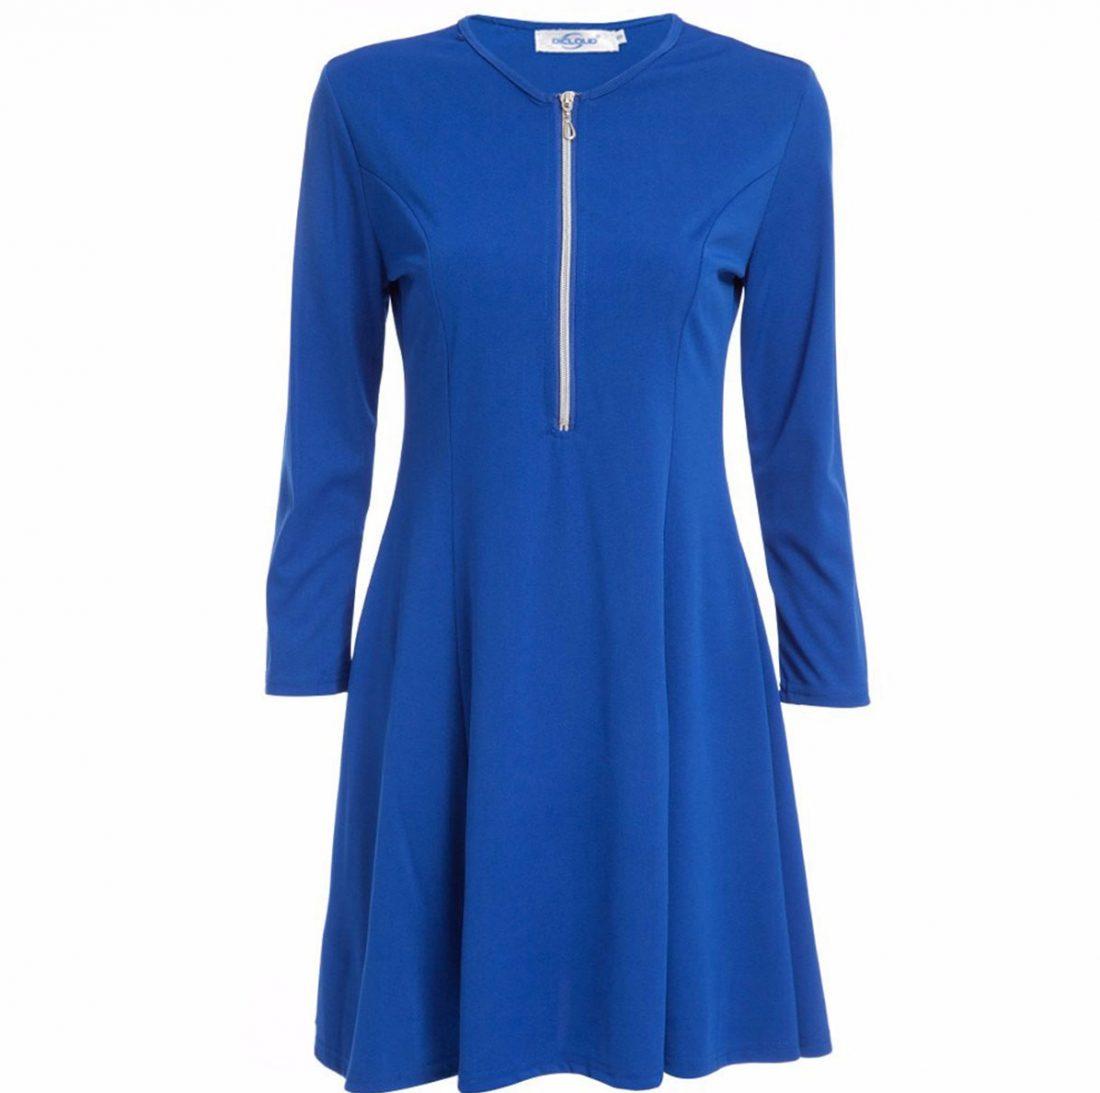 M0184 blue2 Leisure Dresses maureens.com boutique